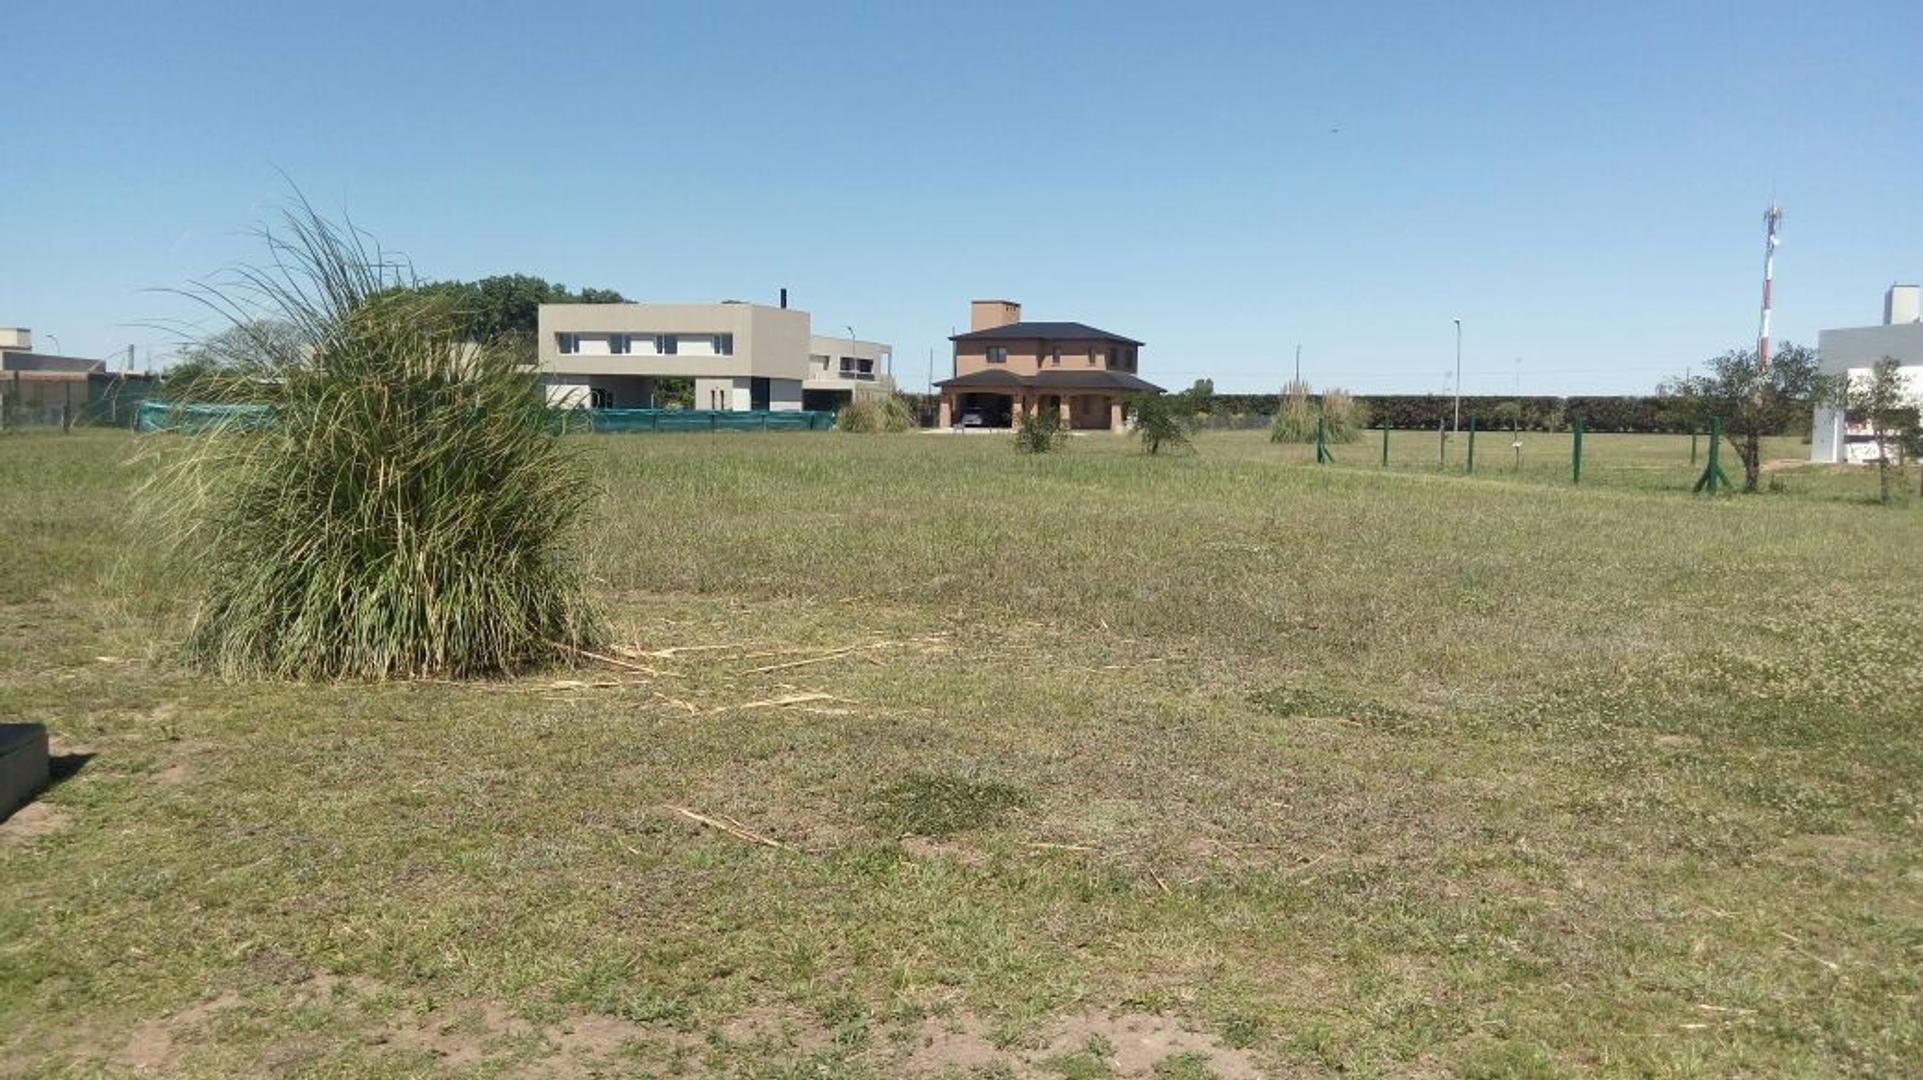 Proyecto de casa de 300 metros en espectacular terreno de mas de 1000 metros en Cul de Sac